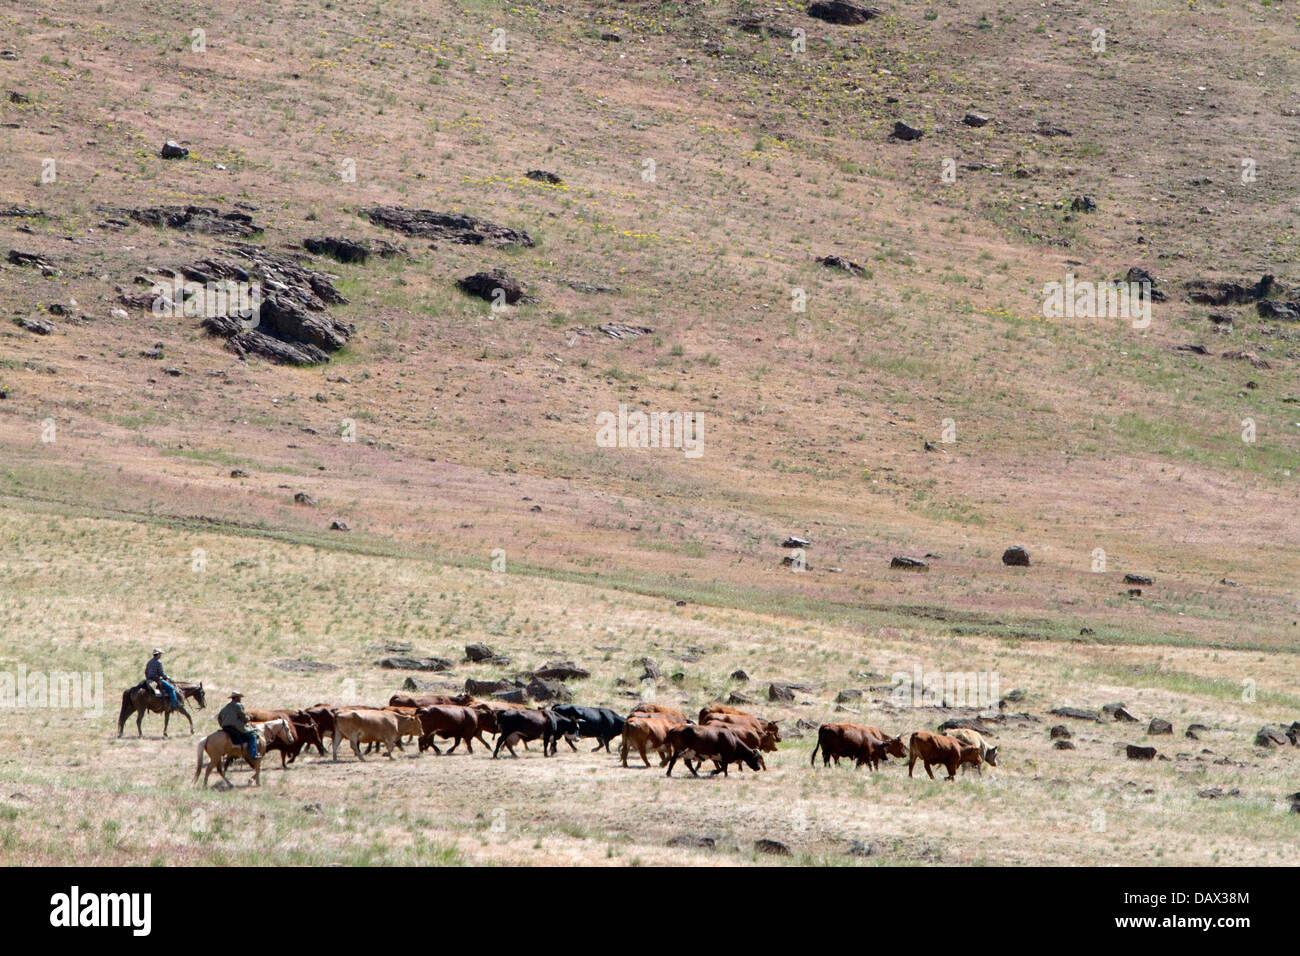 Ranchers round up cattle on grazing land near Mountain Home, Idaho, USA. Stock Photo